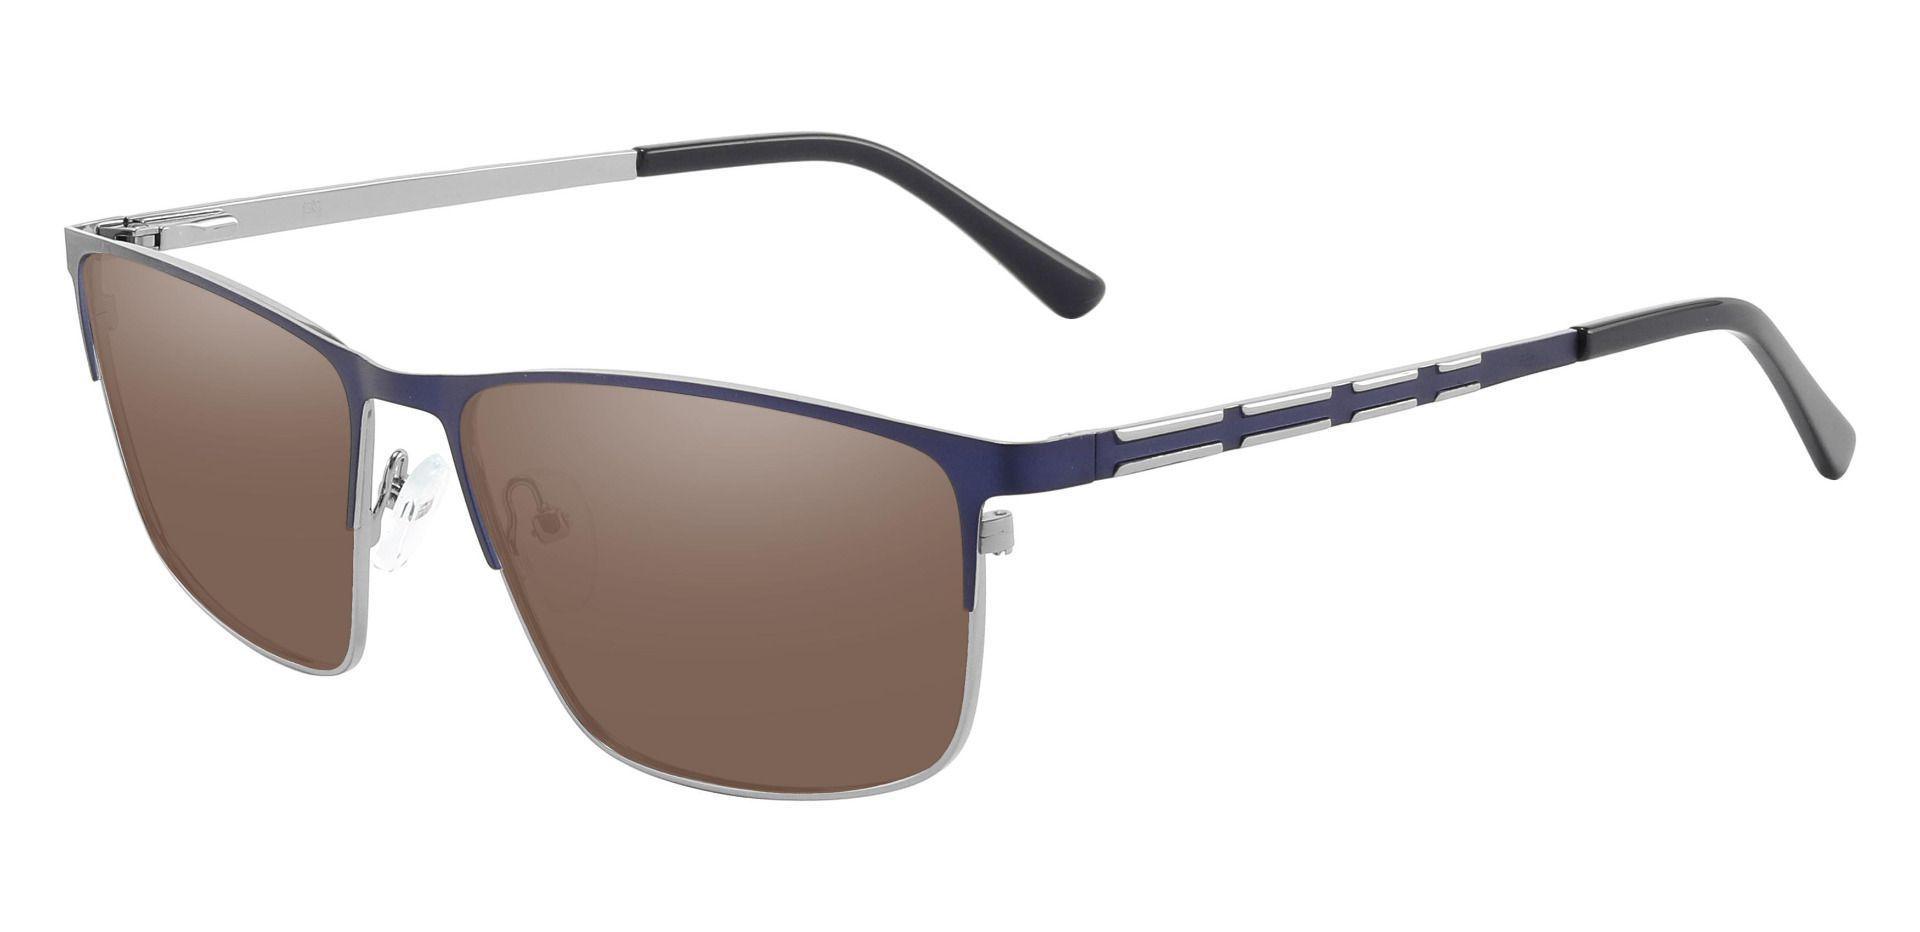 Hamlet Browline Prescription Sunglasses - Blue Frame With Brown Lenses